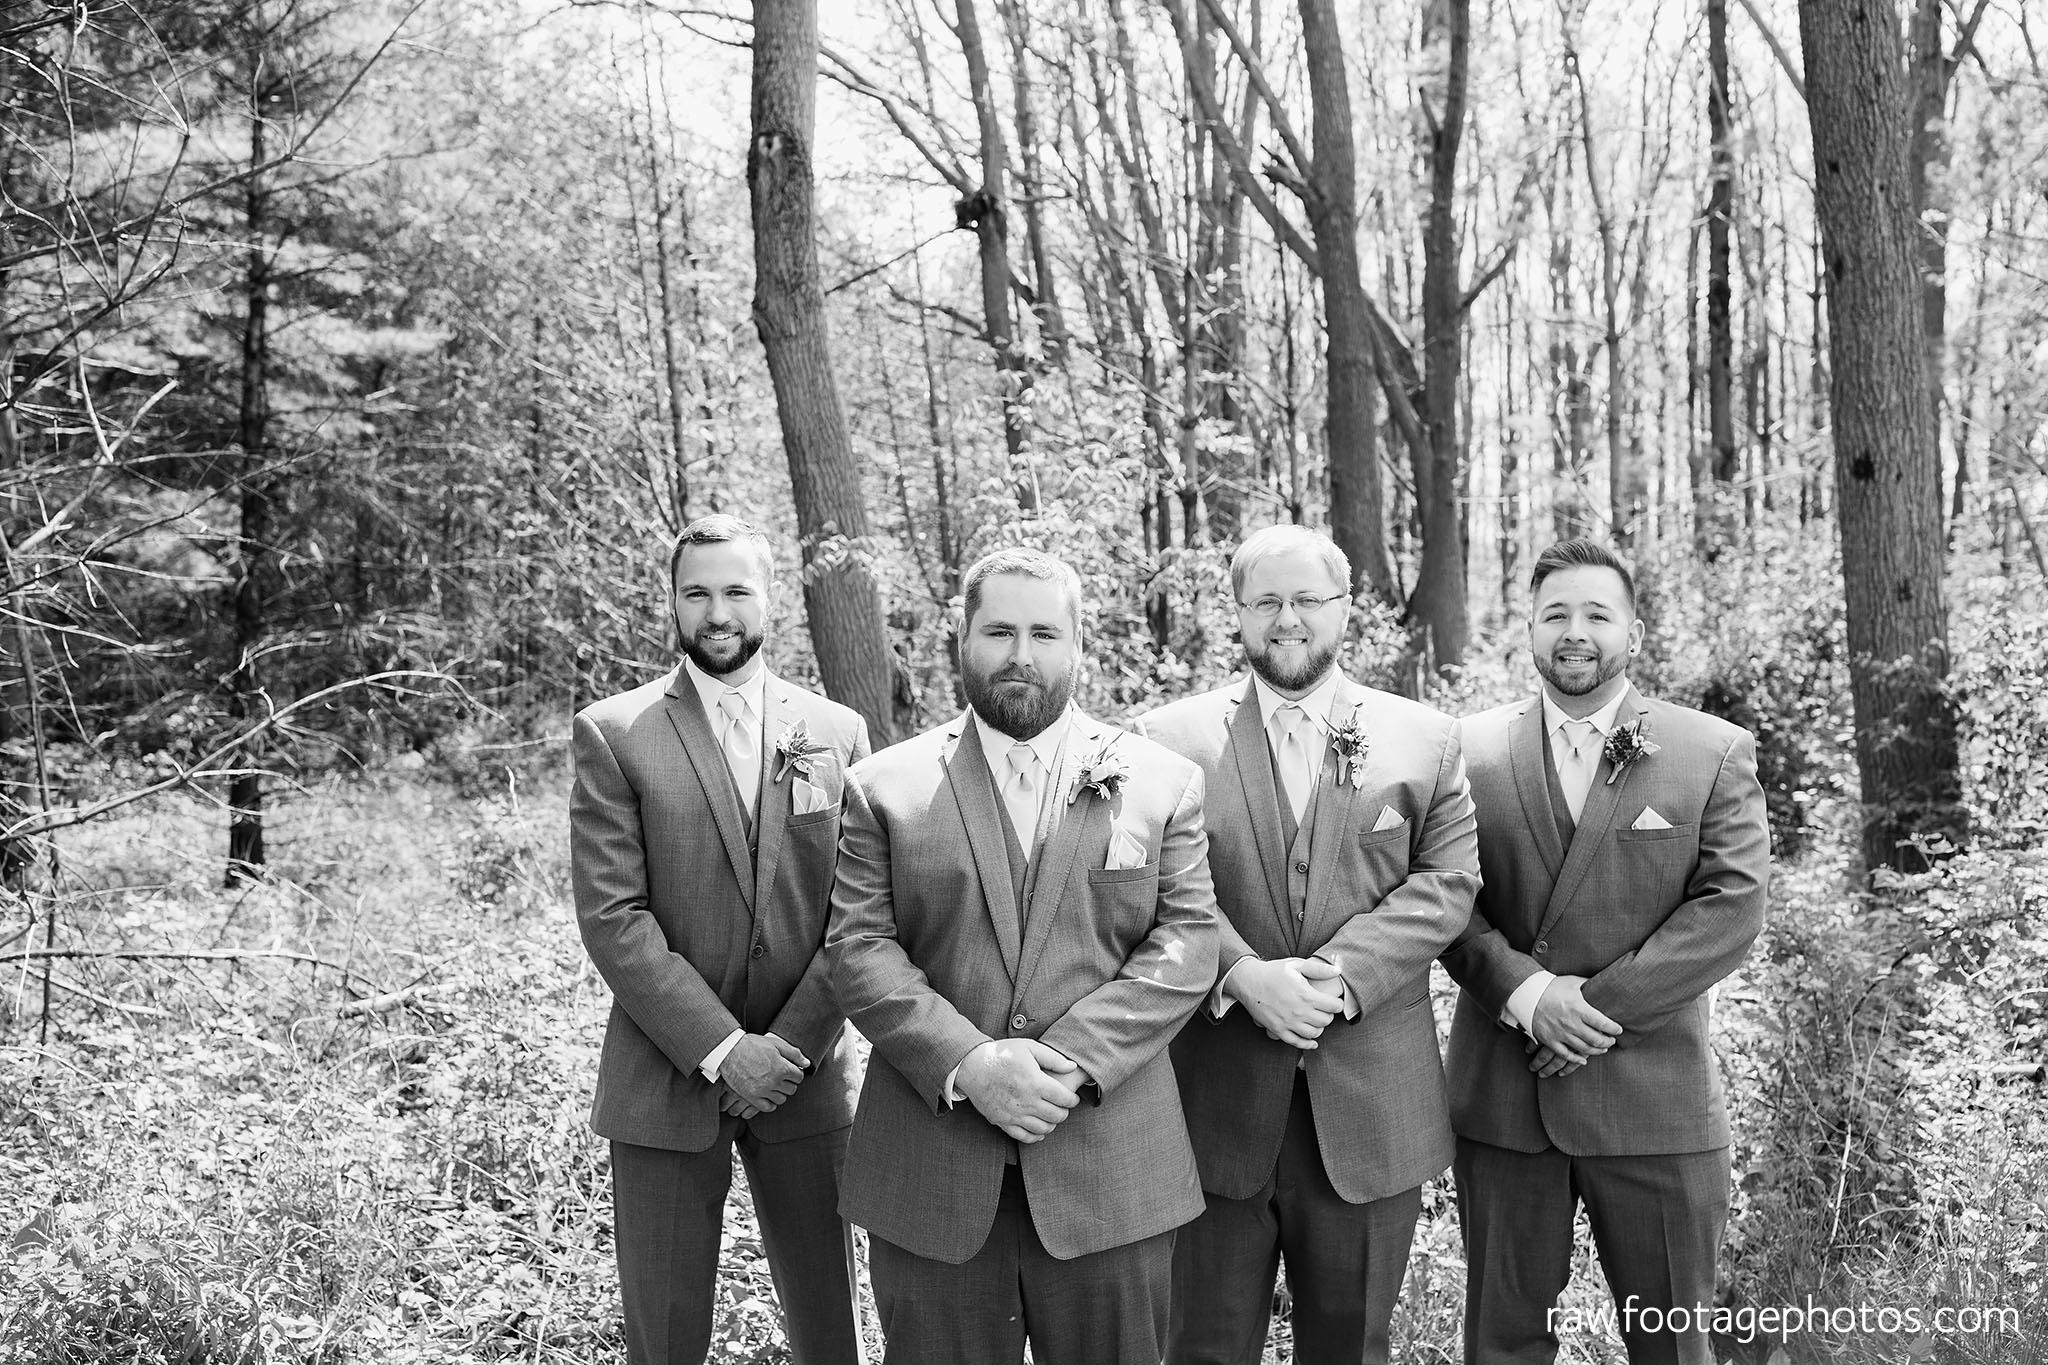 london_ontario_wedding_photographer-century_wedding_barn-raw_footage_photography-diy_wedding050.jpg